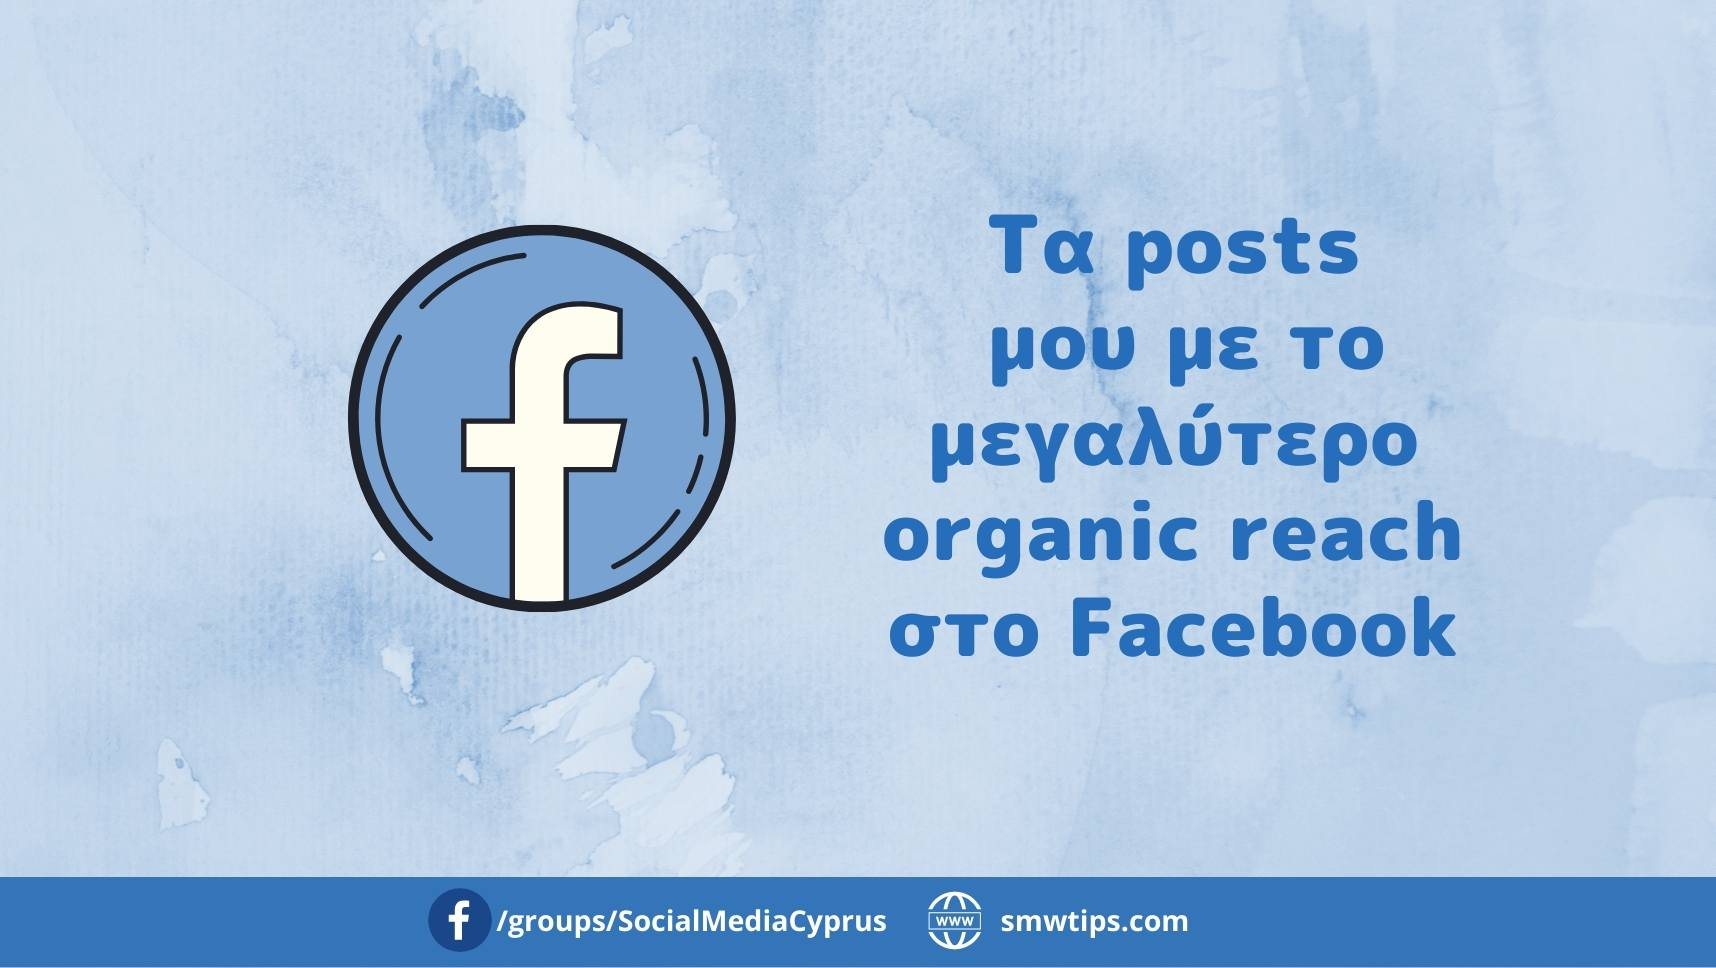 Tα posts μου με το μεγαλύτερο organic reach στο Facebook